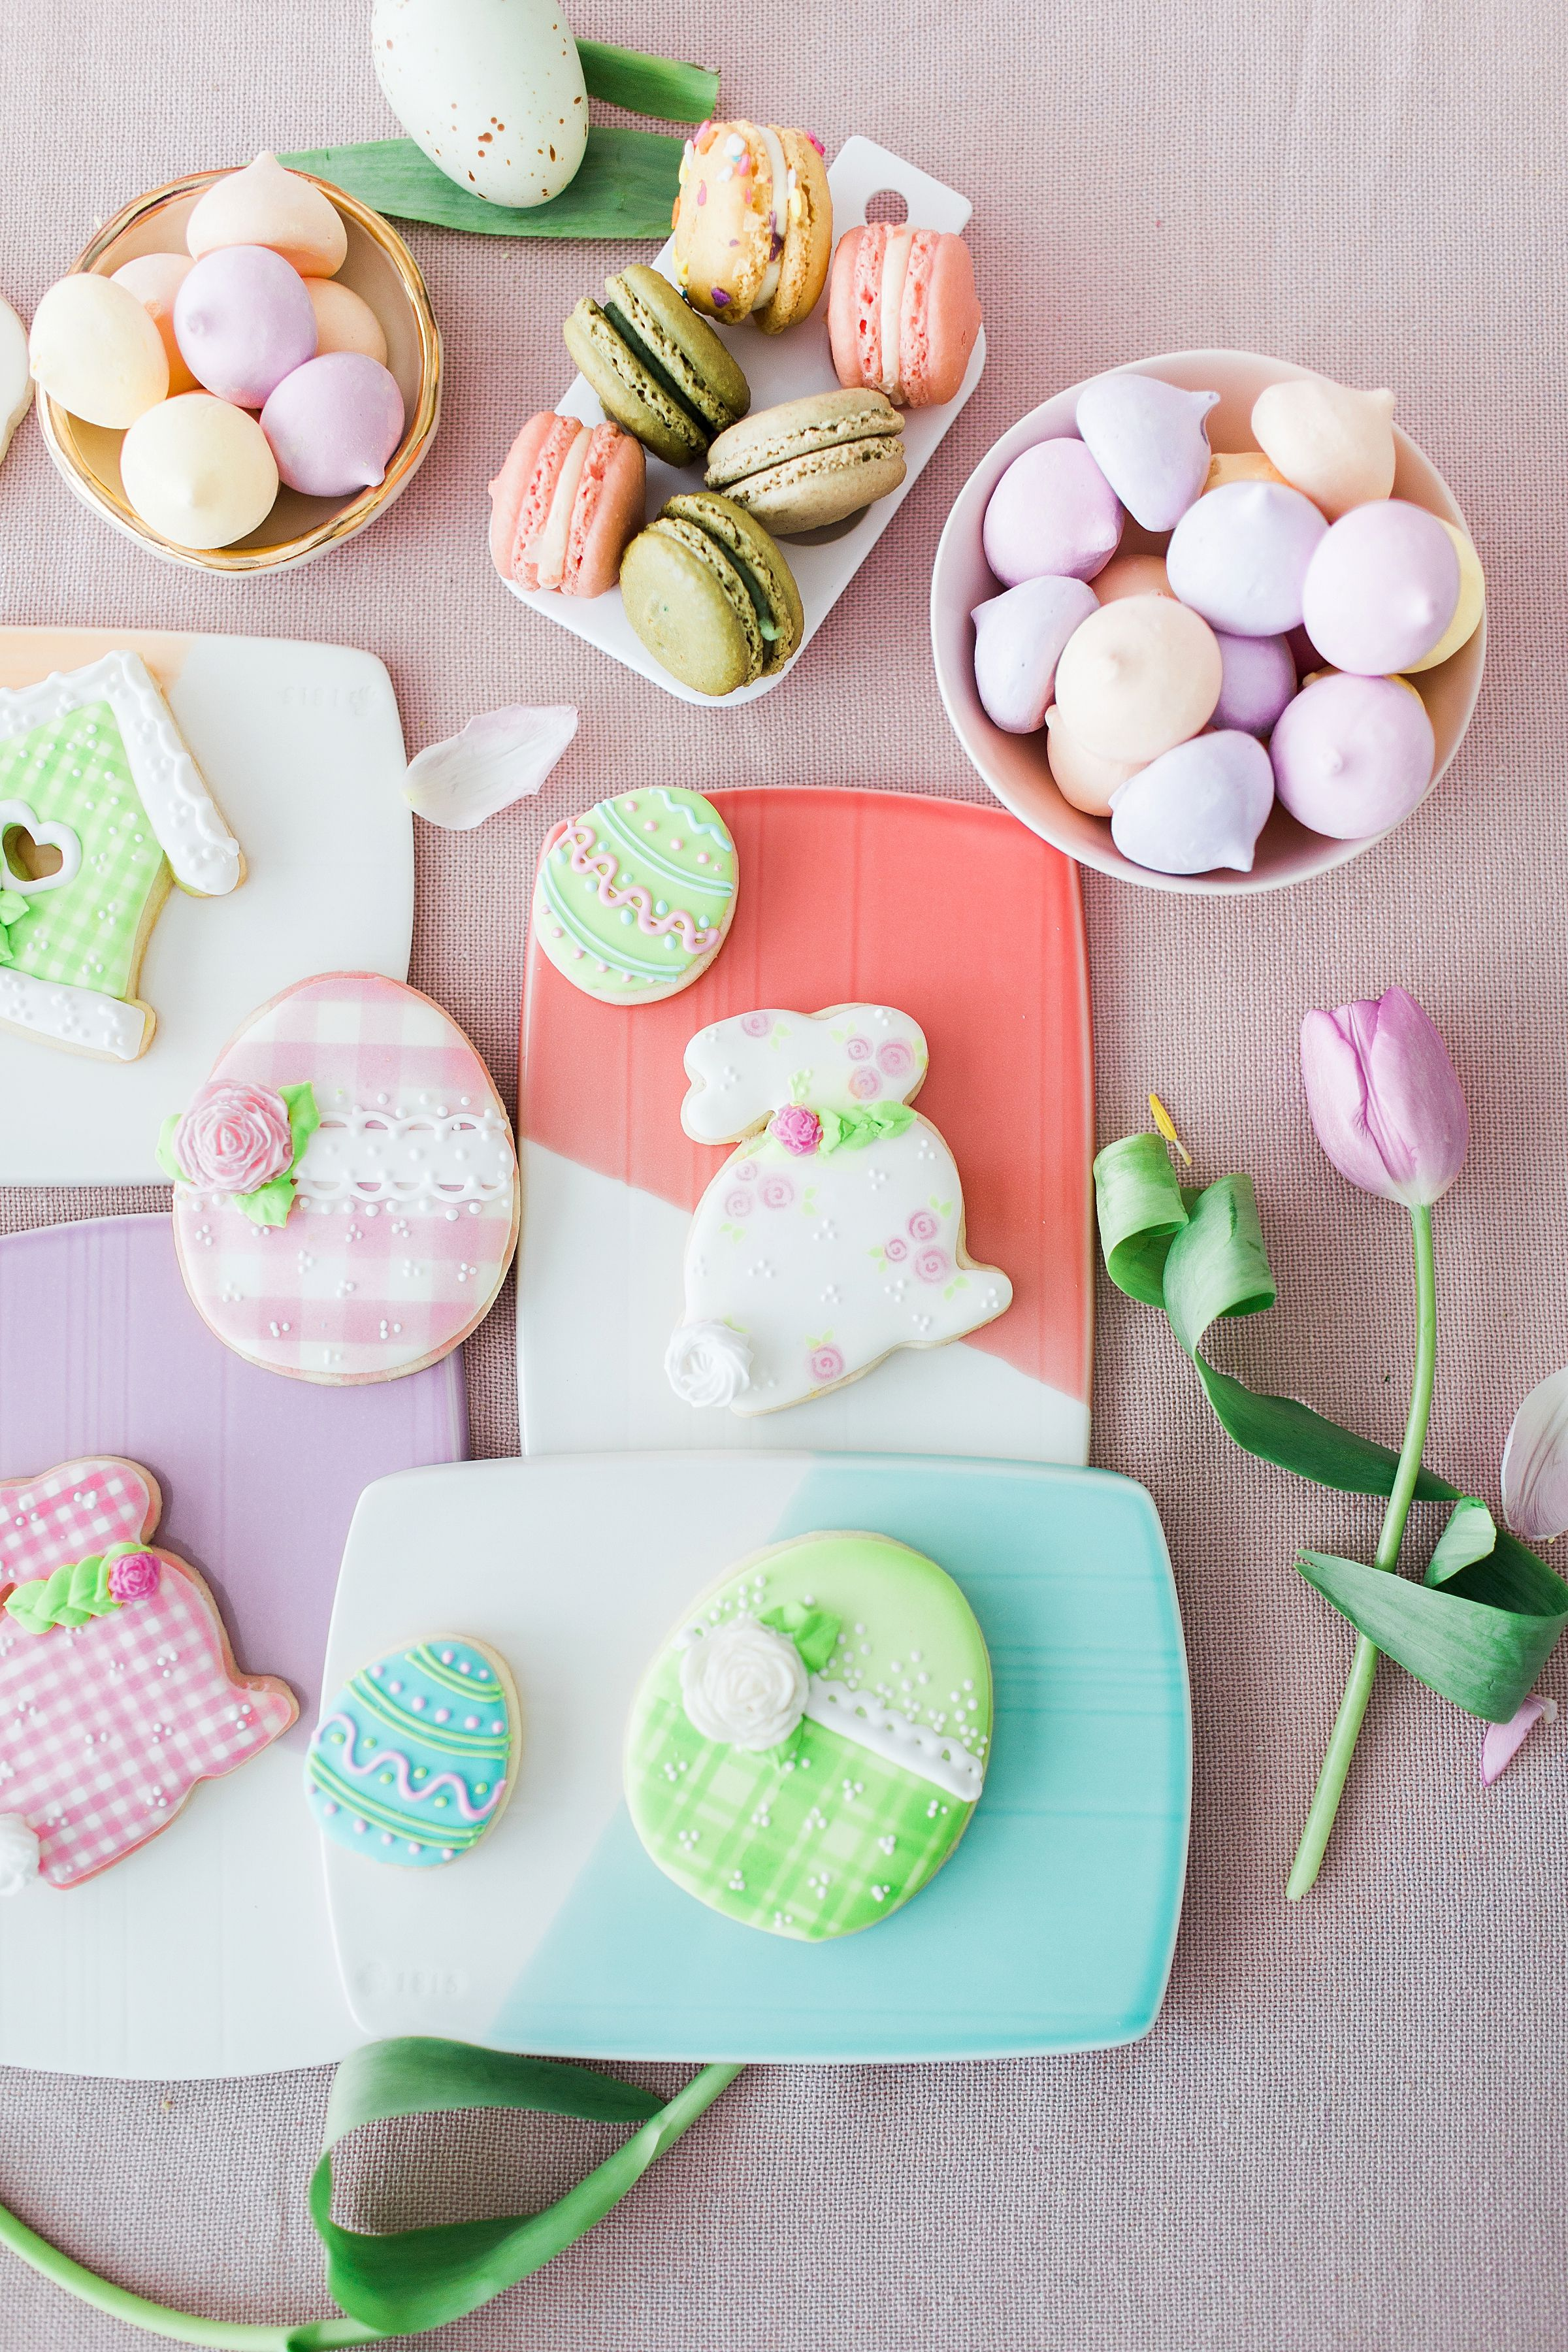 Easter Macaron Decorating Party Harmony Lynn Easter Inspiration Easter Kids Table Easter Party